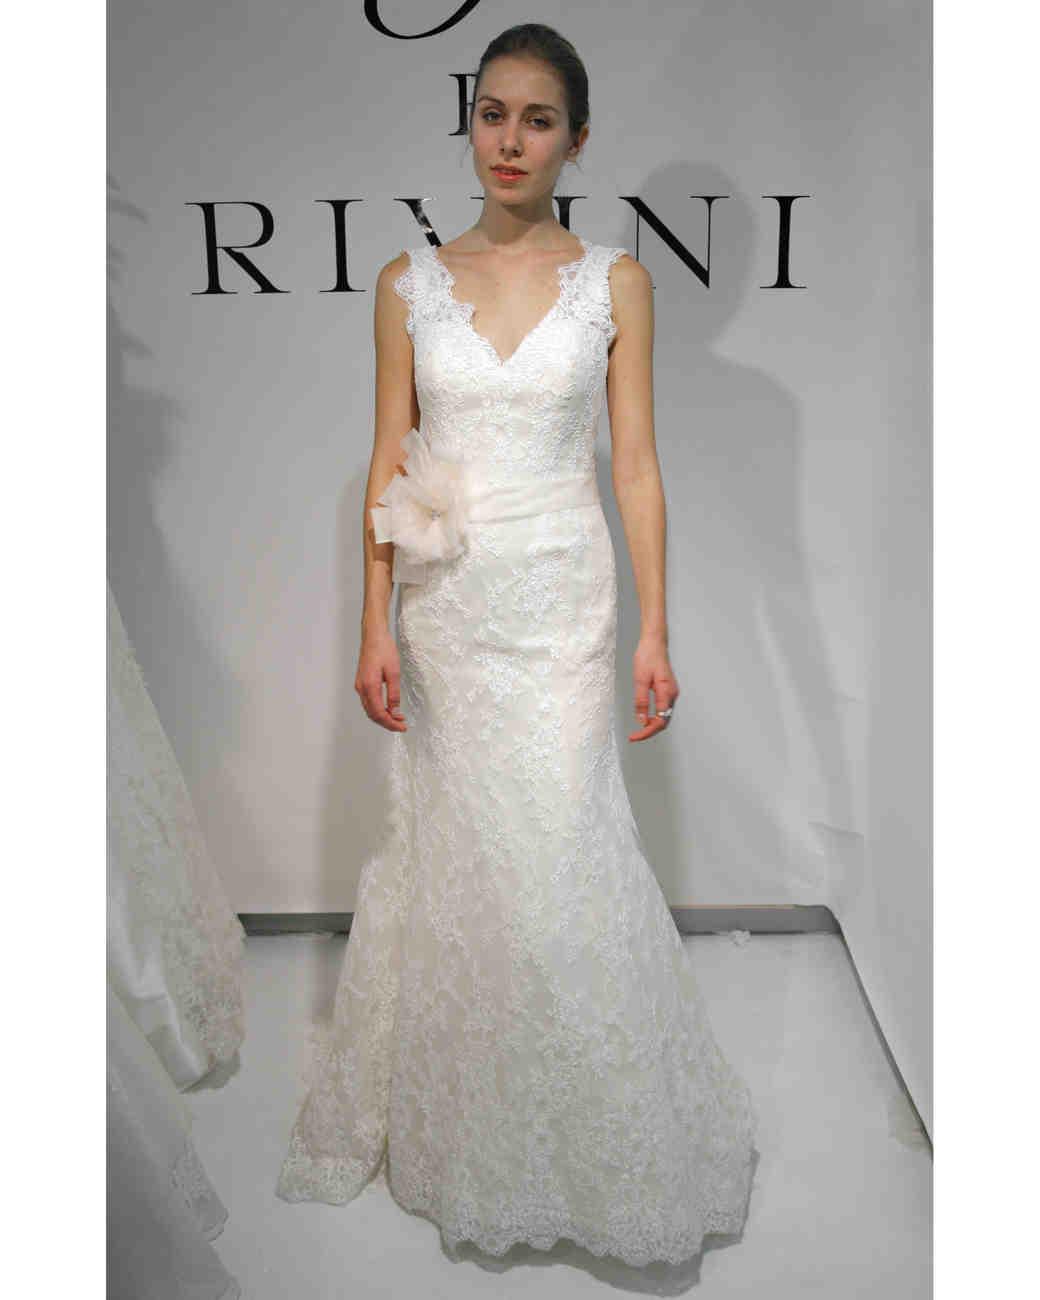 alyne-by-rivini-fall2012-wd108109-003.jpg